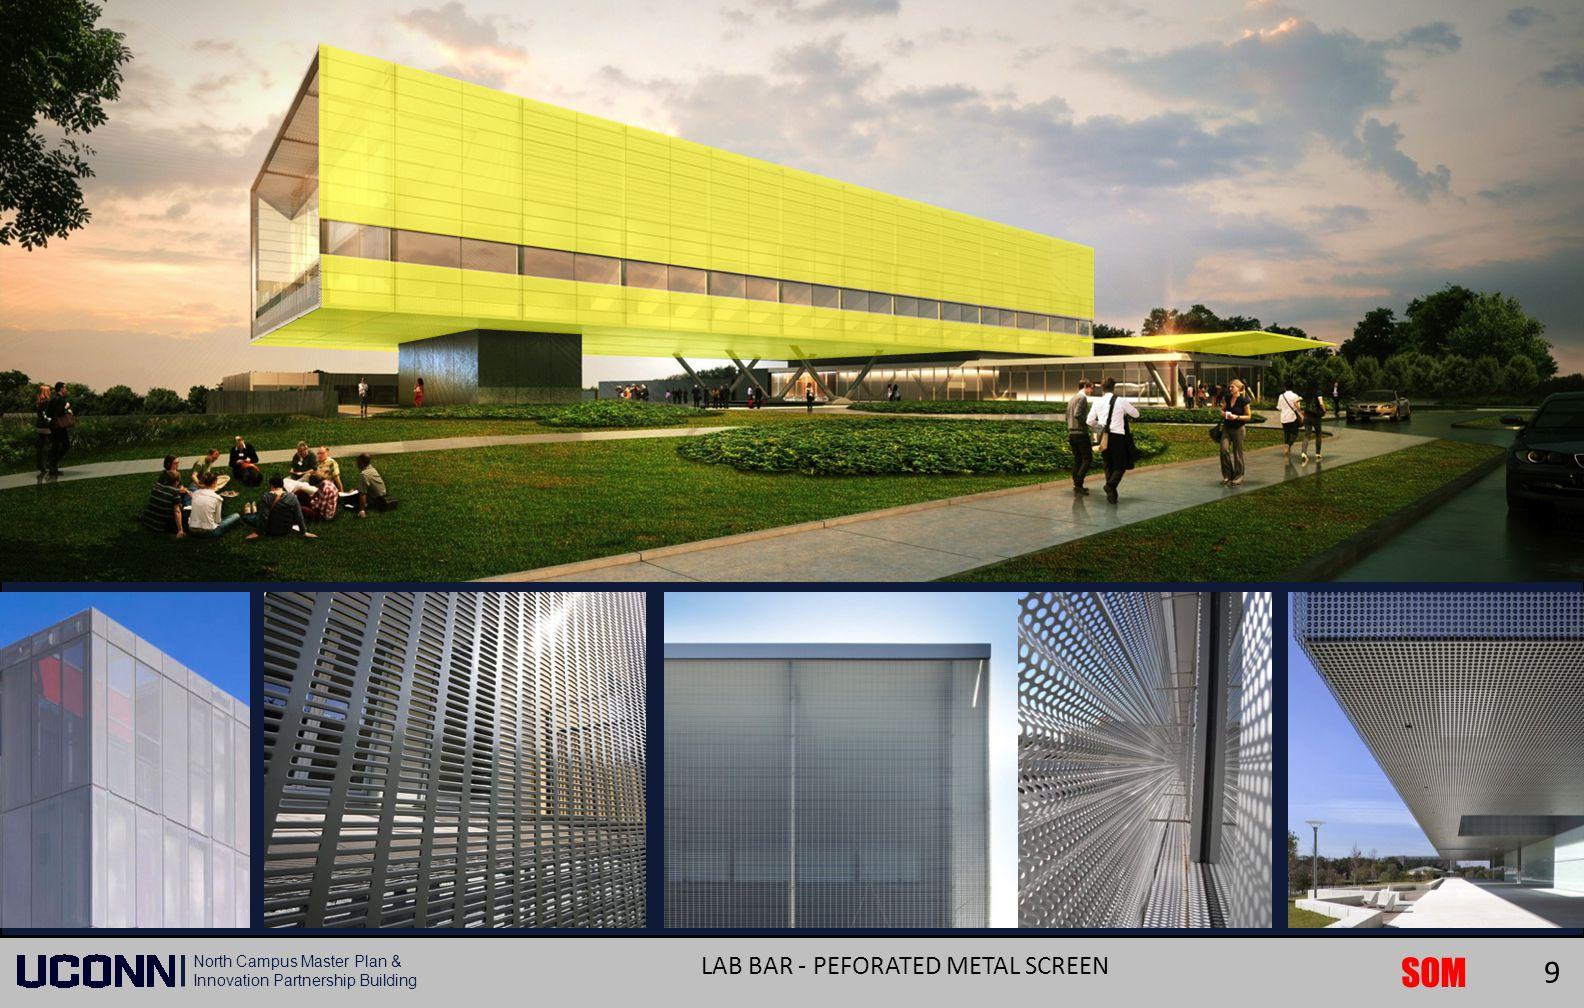 SOM North Campus Master Plan & Innovation Partnership Building LAB BAR - PEFORATED METAL SCREEN 9